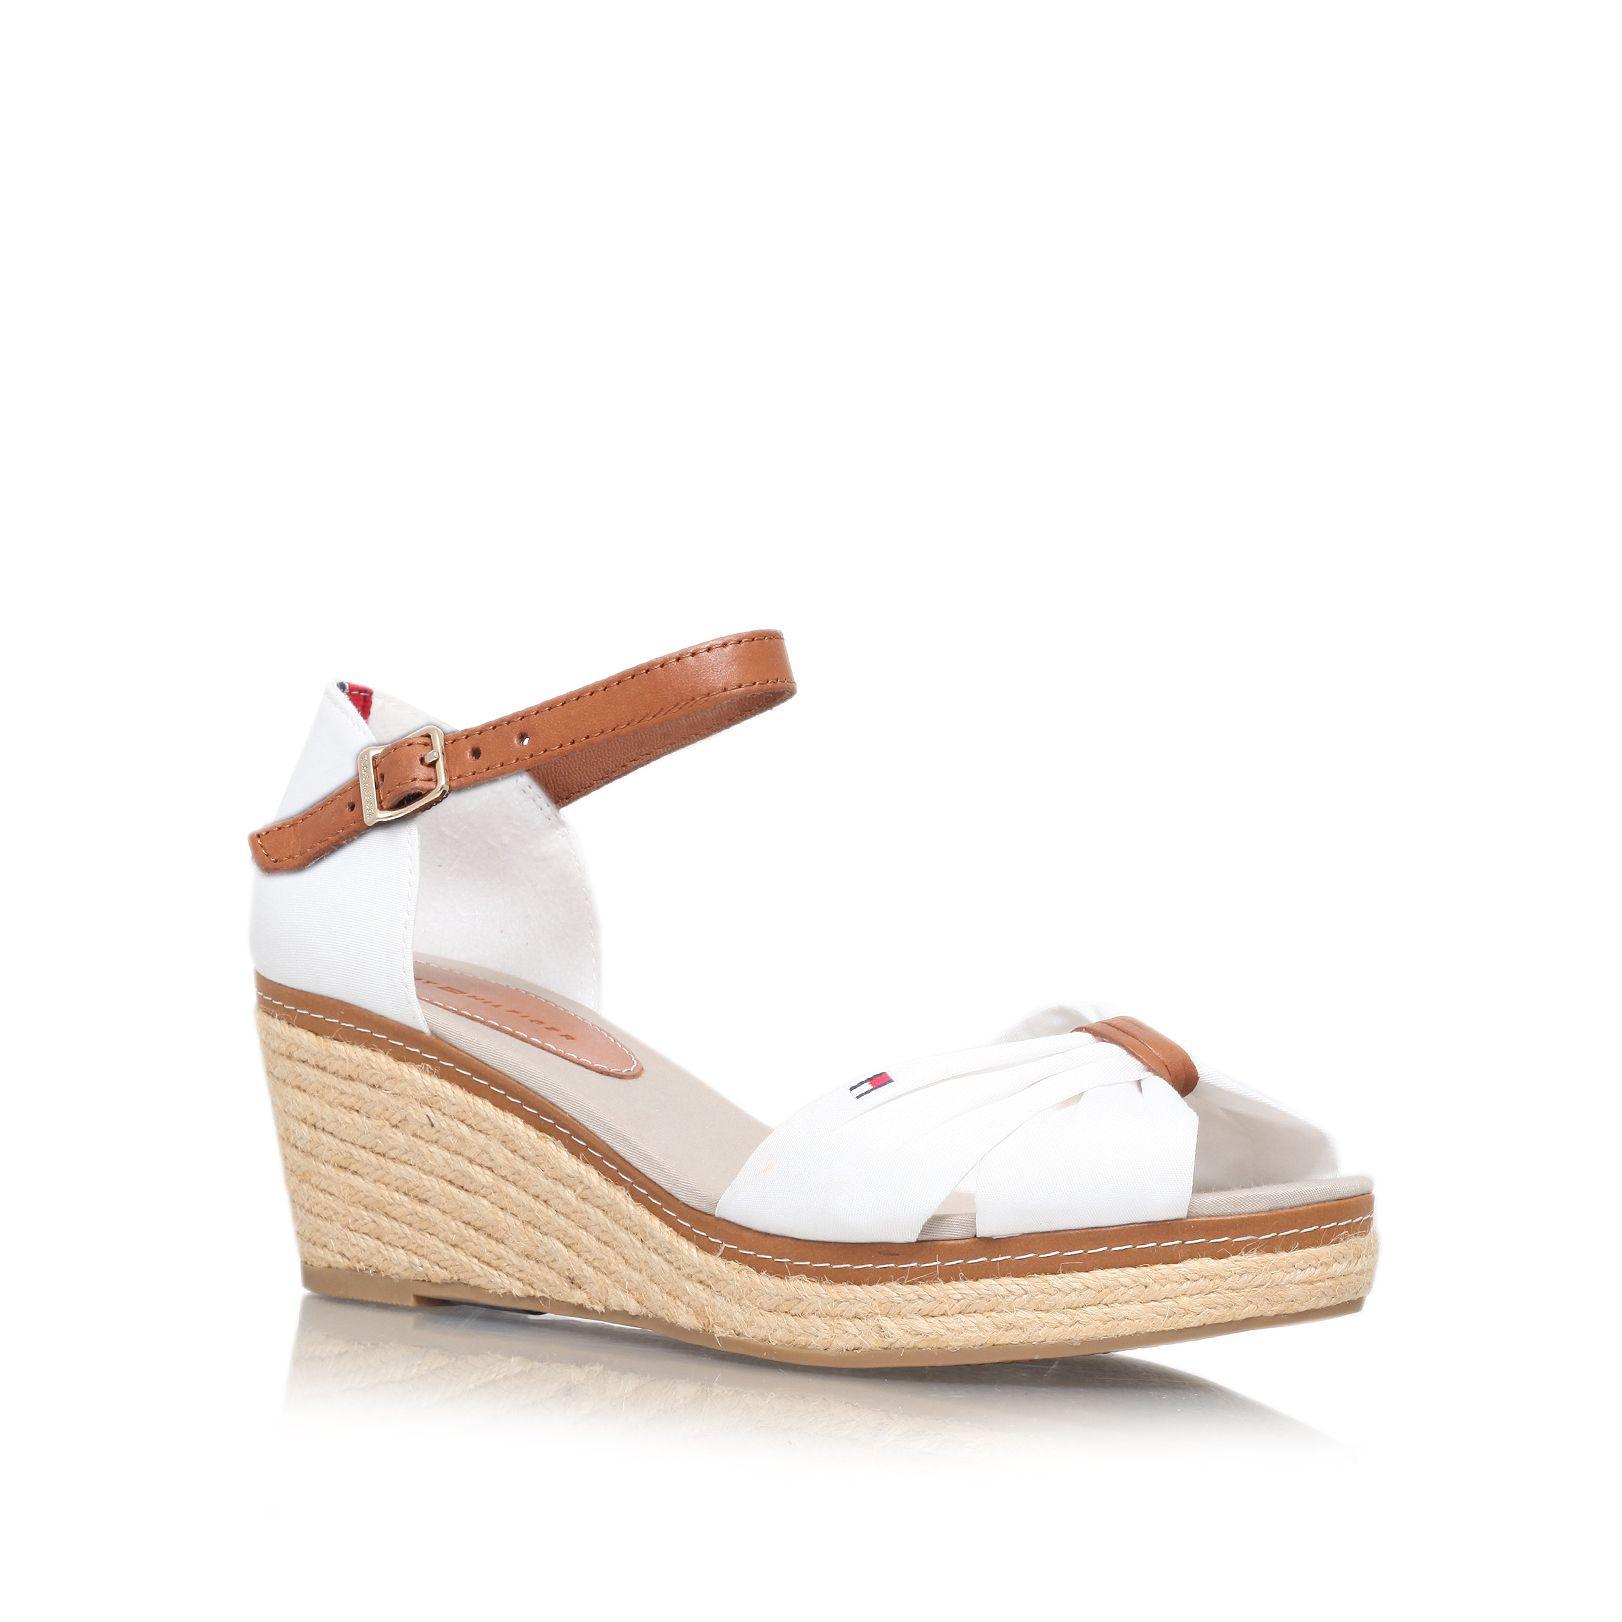 tommy hilfiger elba 19d mid wedge heel sandals in white lyst. Black Bedroom Furniture Sets. Home Design Ideas